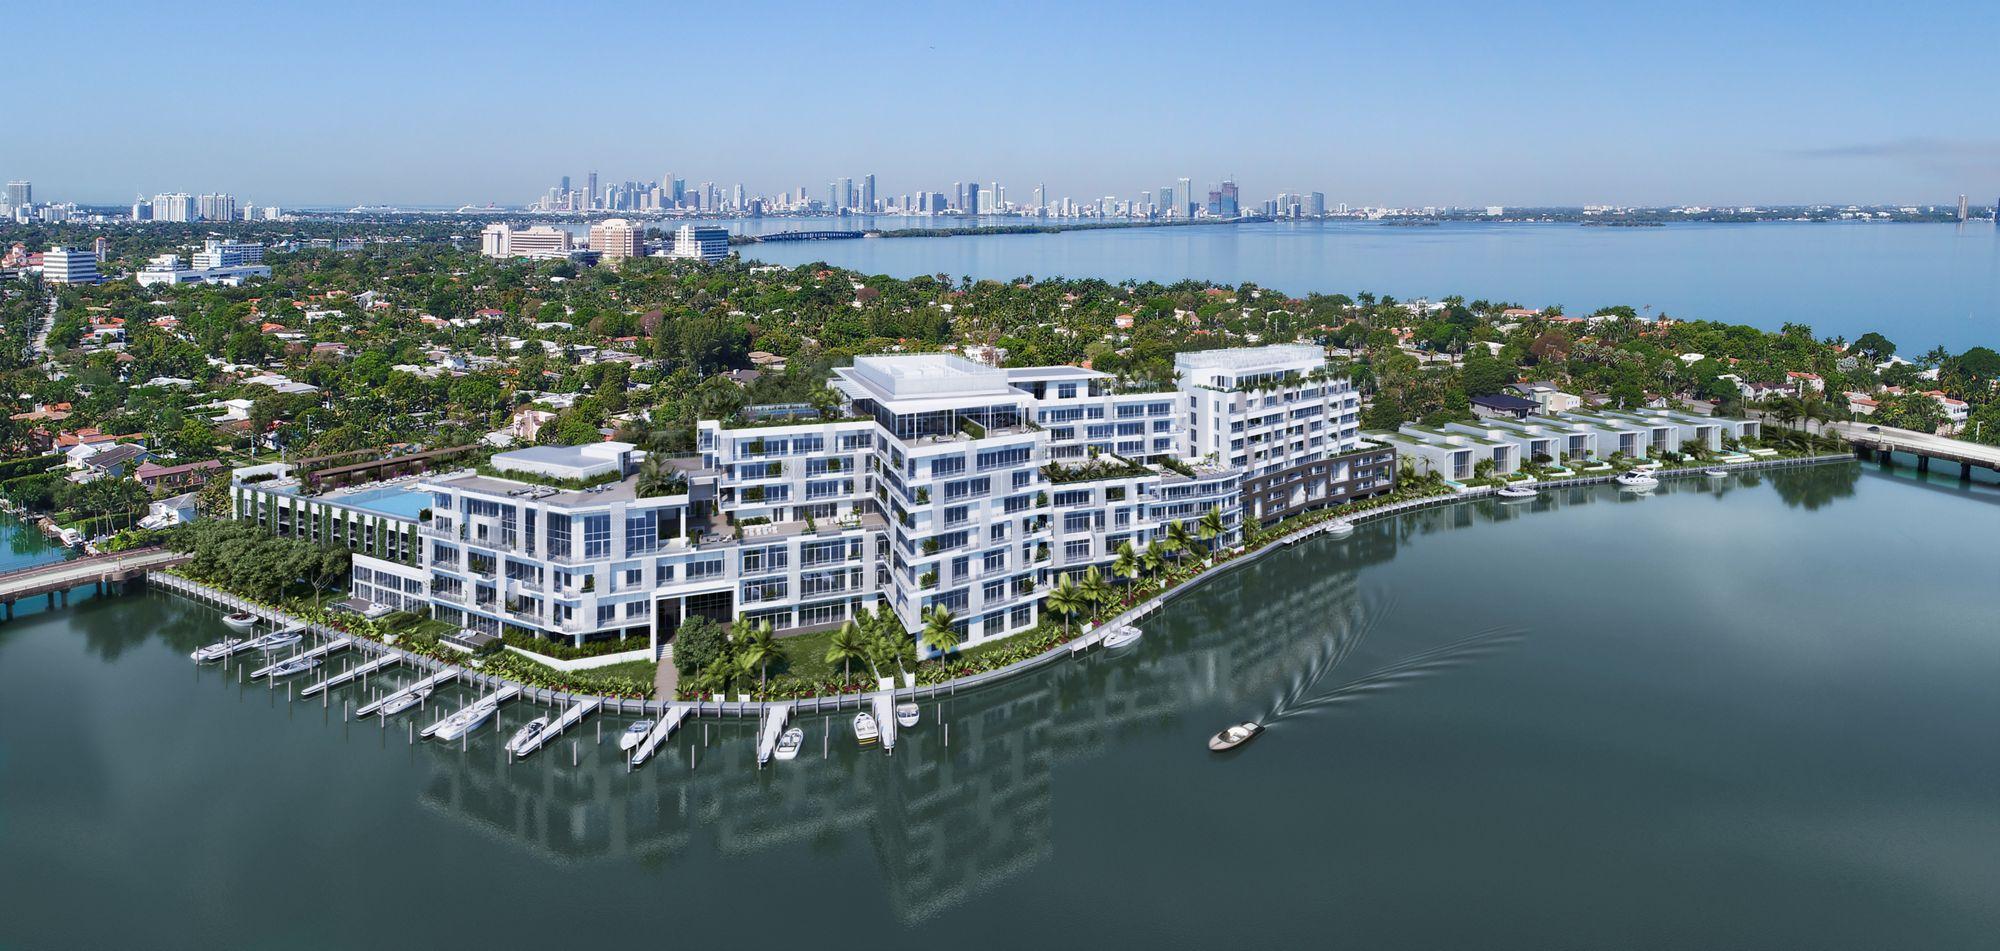 The Villas at The Ritz Carlton Residences Miami Beach   Ritz Carlton Branded Waterfront Homes in Miami Beach